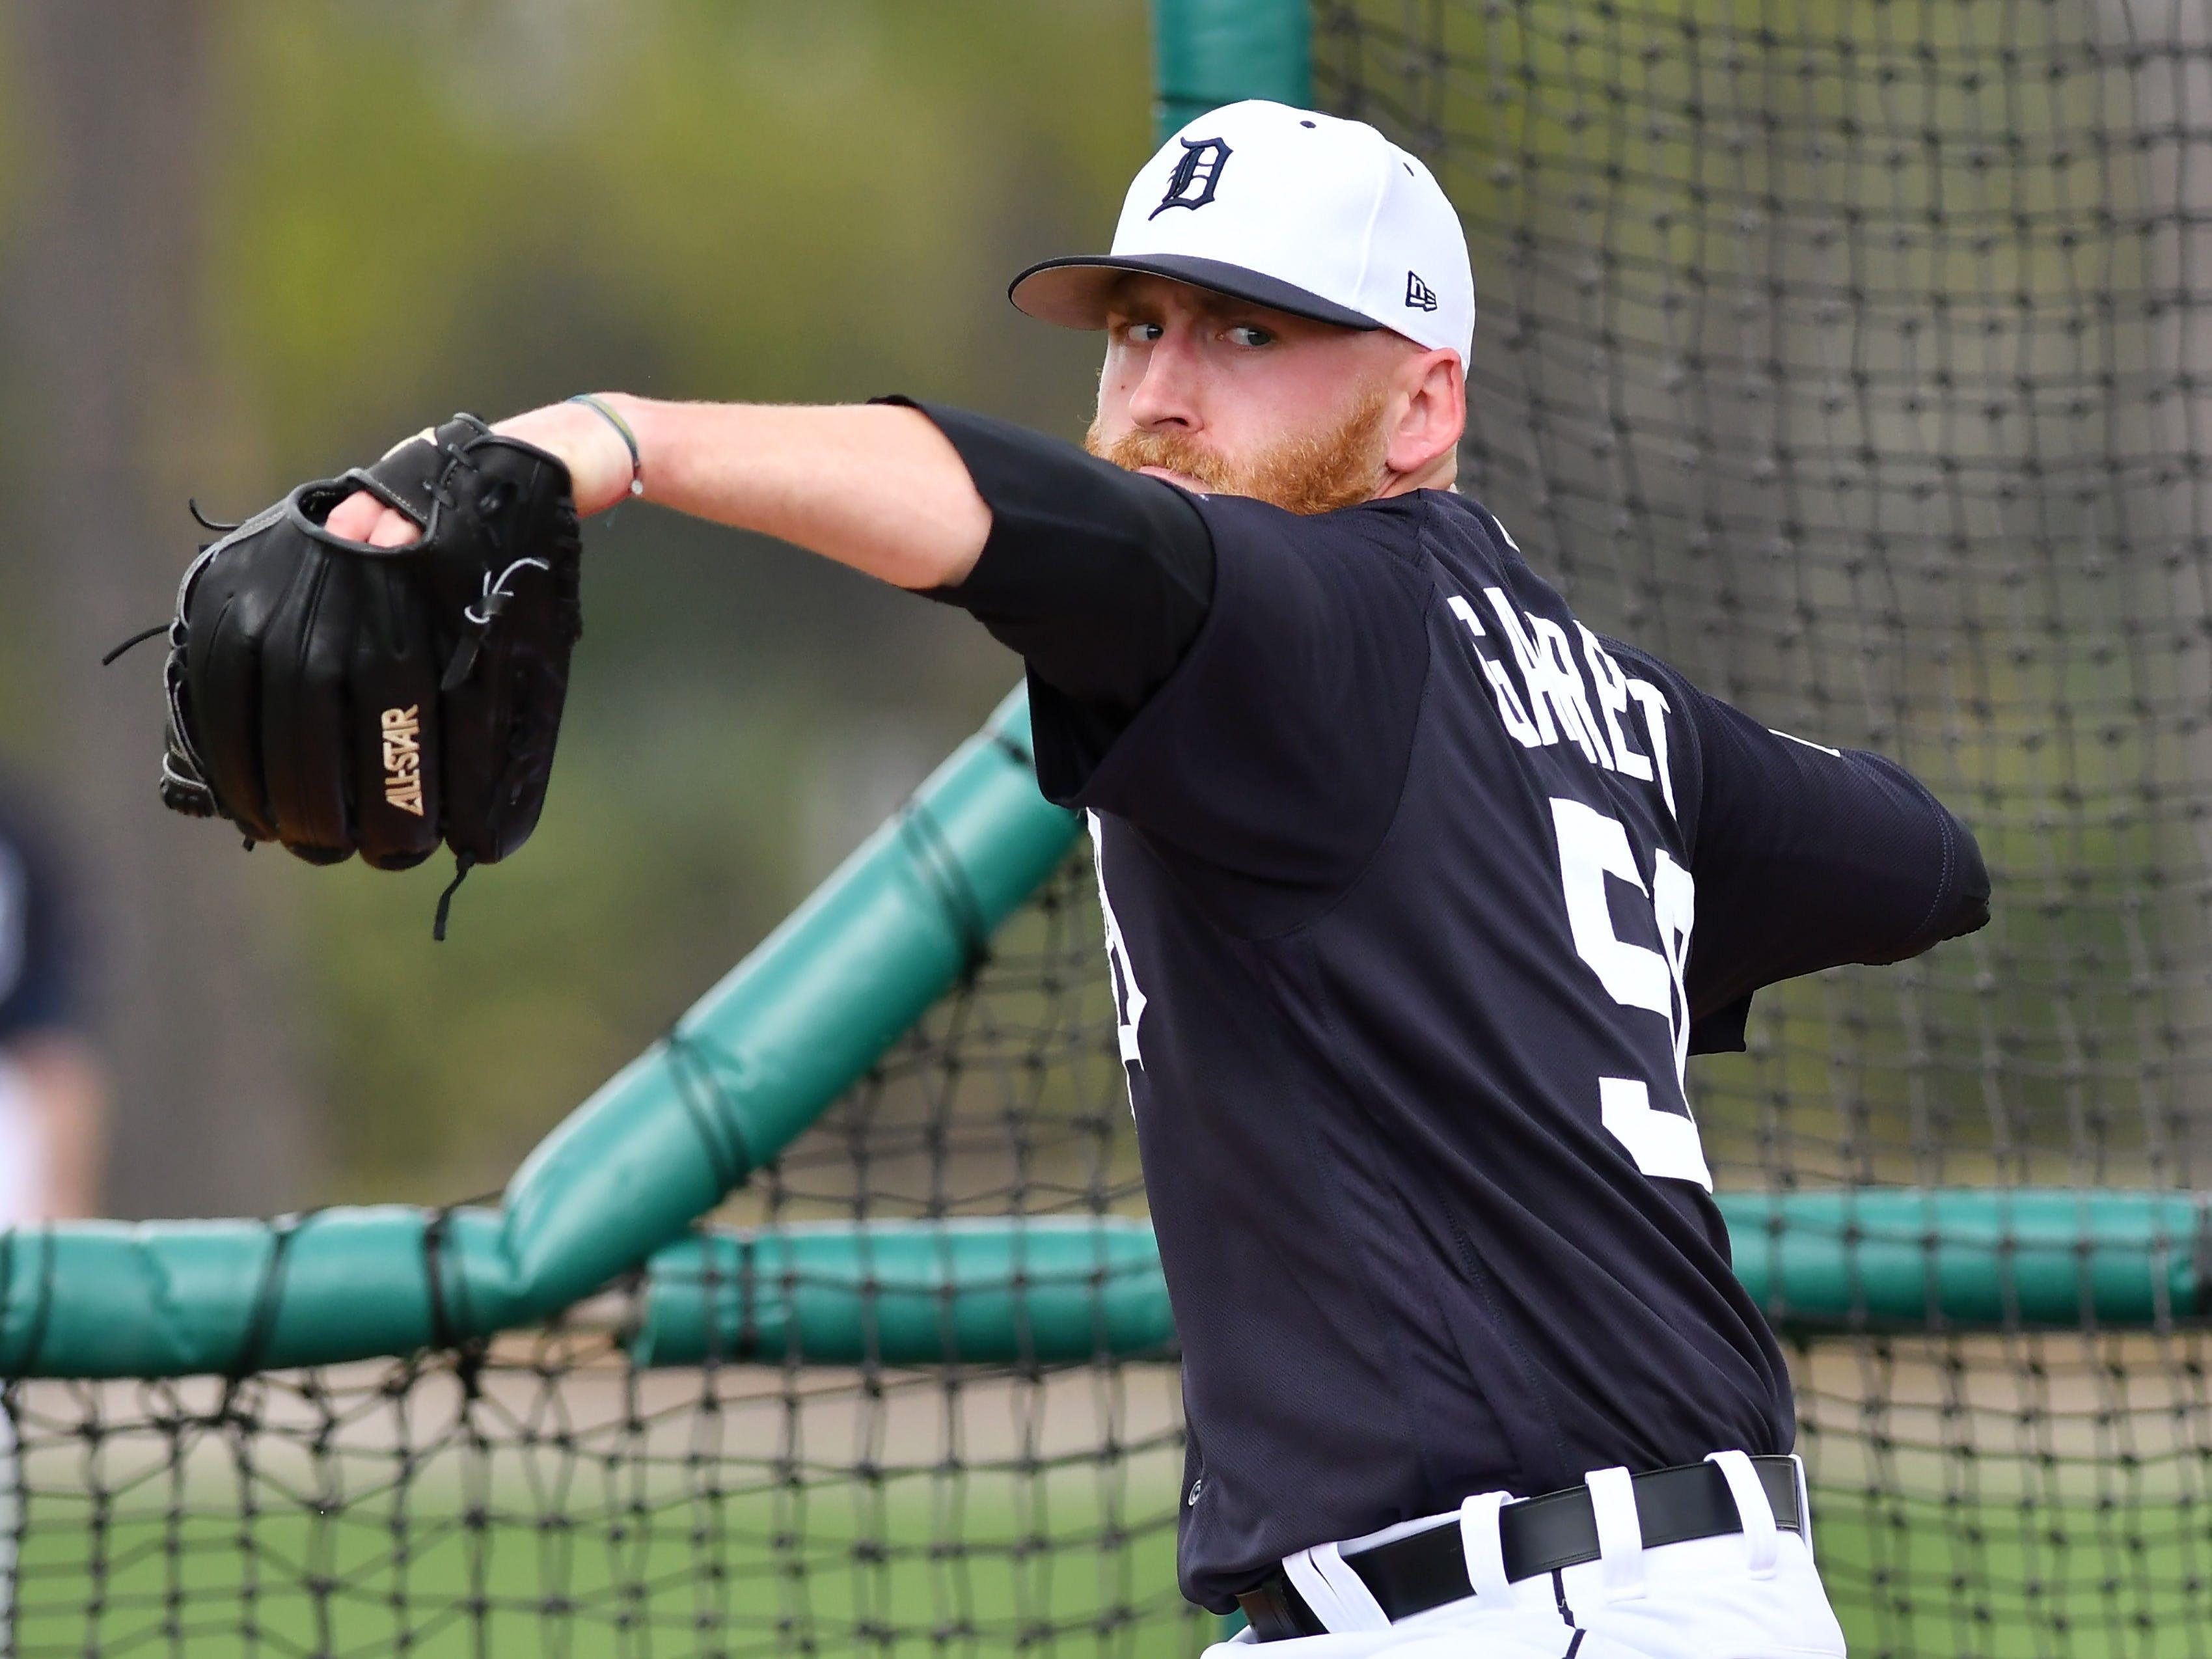 Tigers Rule 5 draft pick Reed Garrett throws live batting practice.